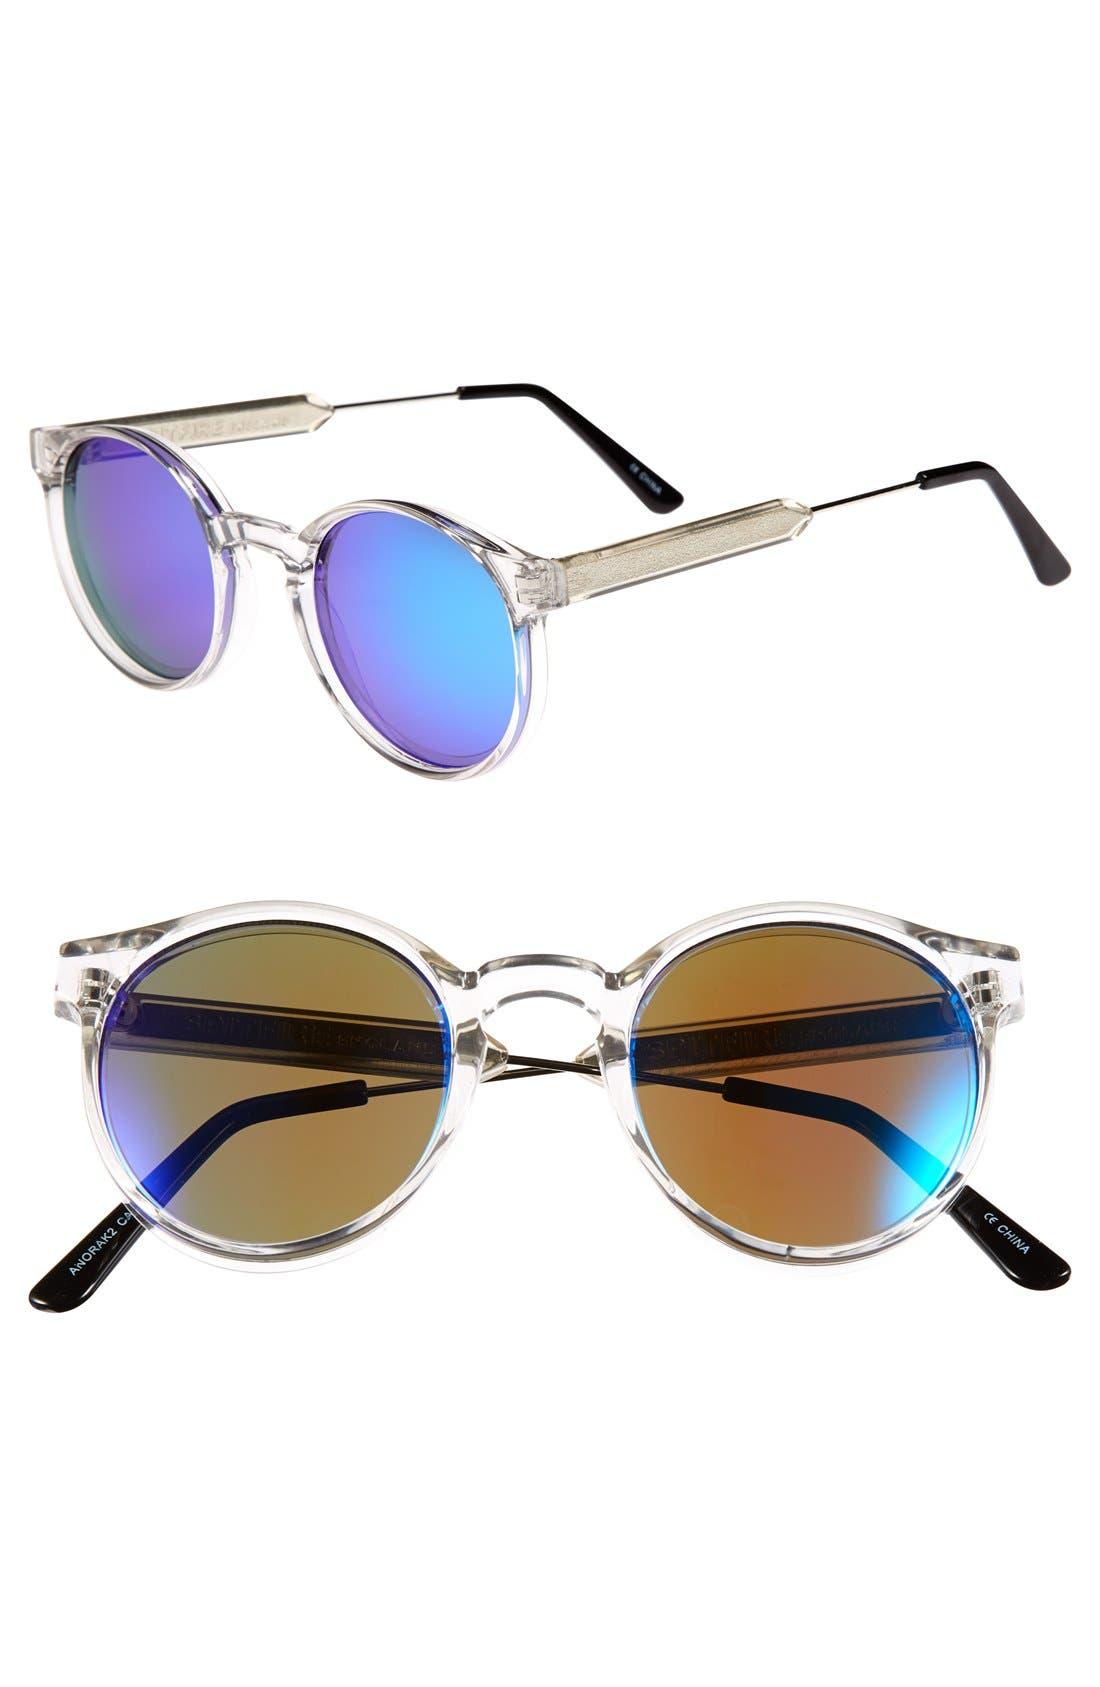 Main Image - Spitfire 47mm Retro Sunglasses